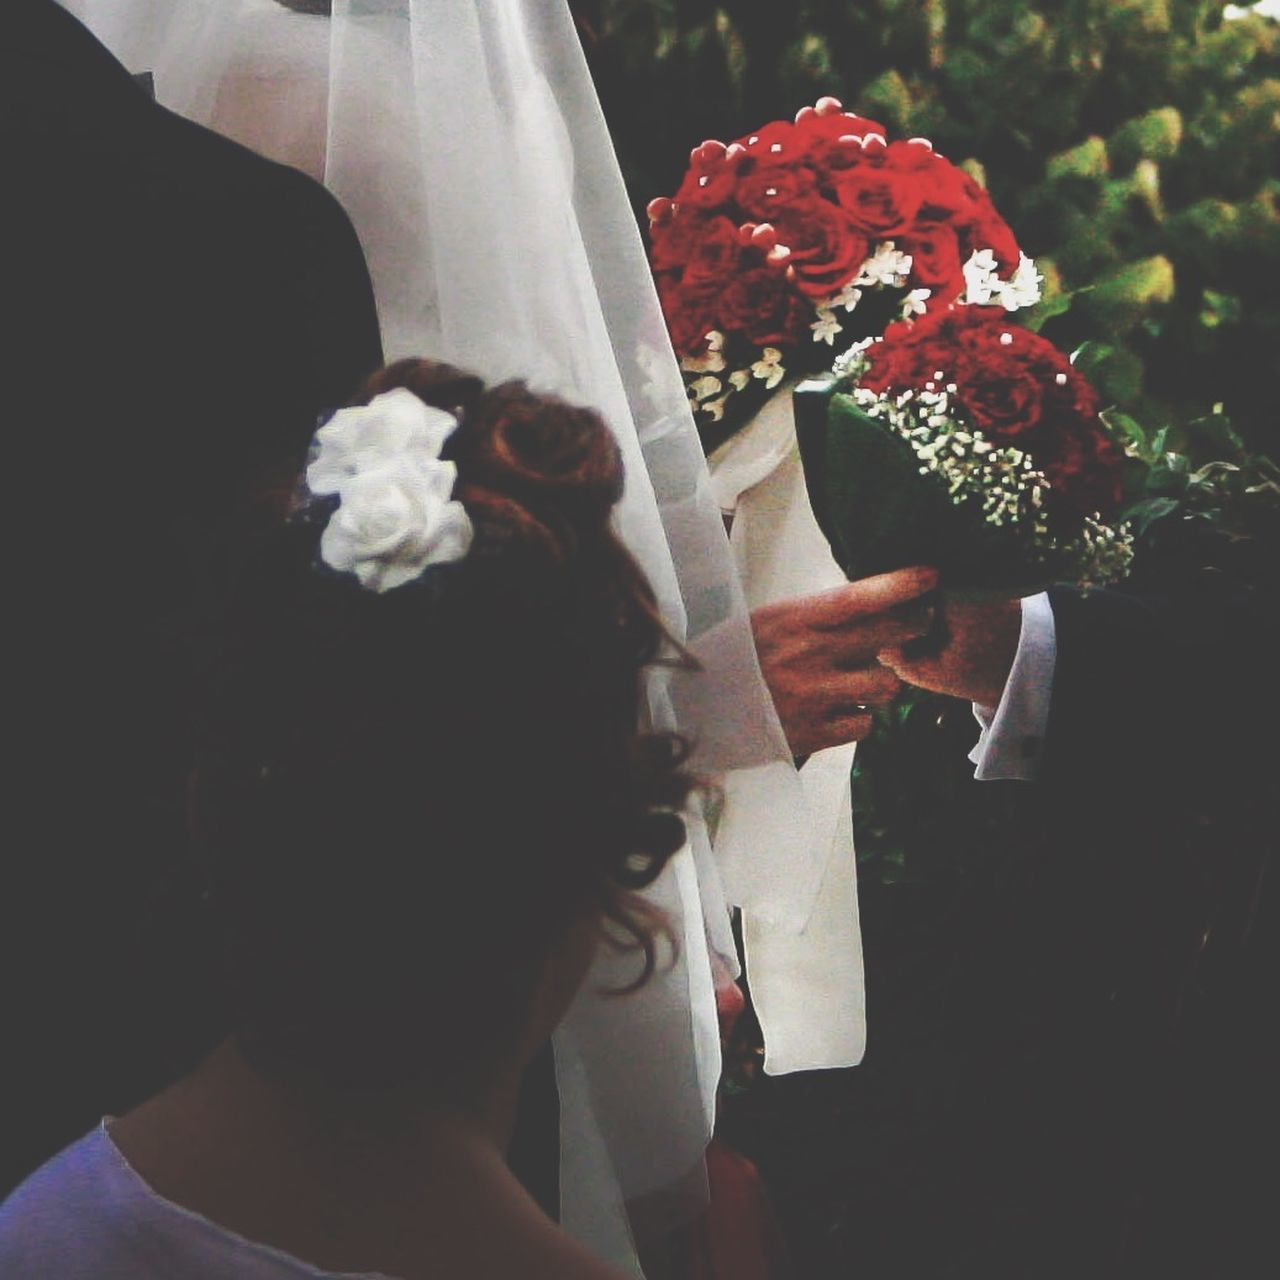 Bride and bridegroom exchanging vows at wedding ceremony